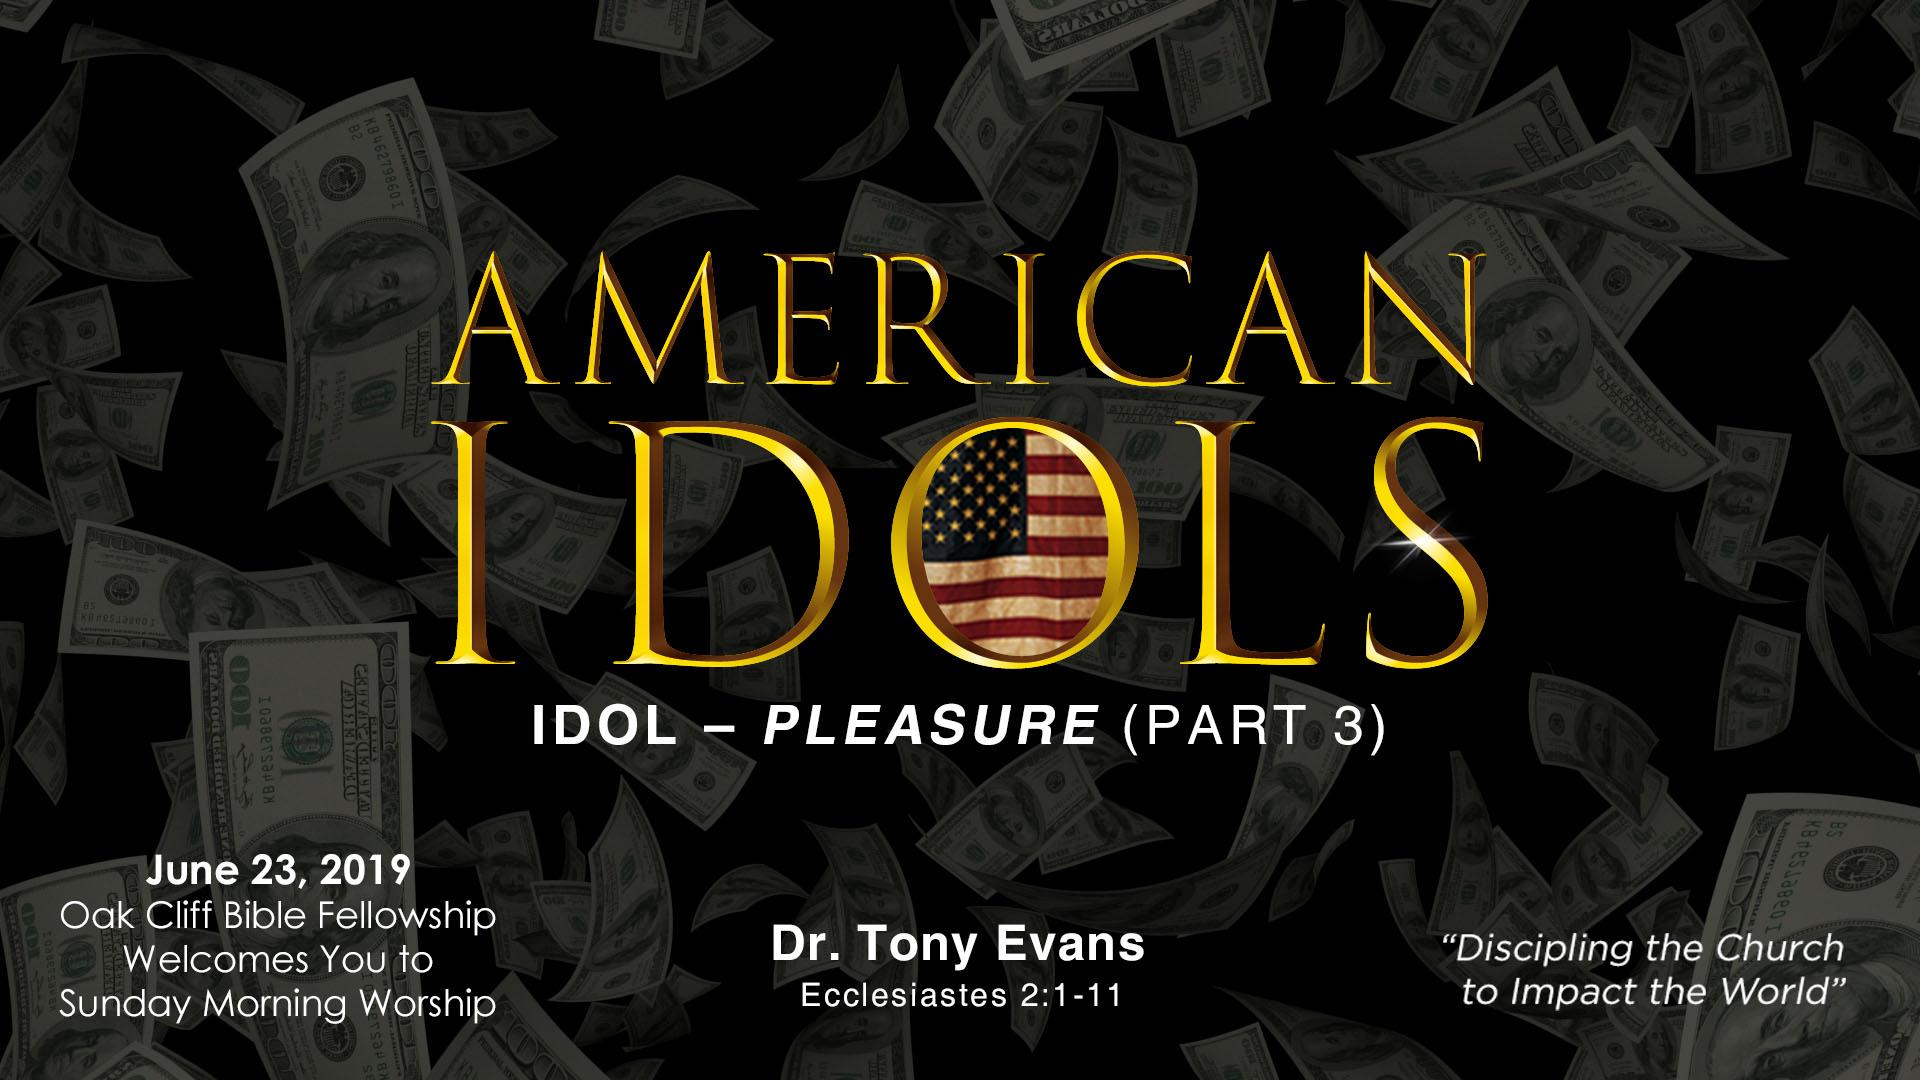 American Idols: Pleasure by Dr. Tony Evans